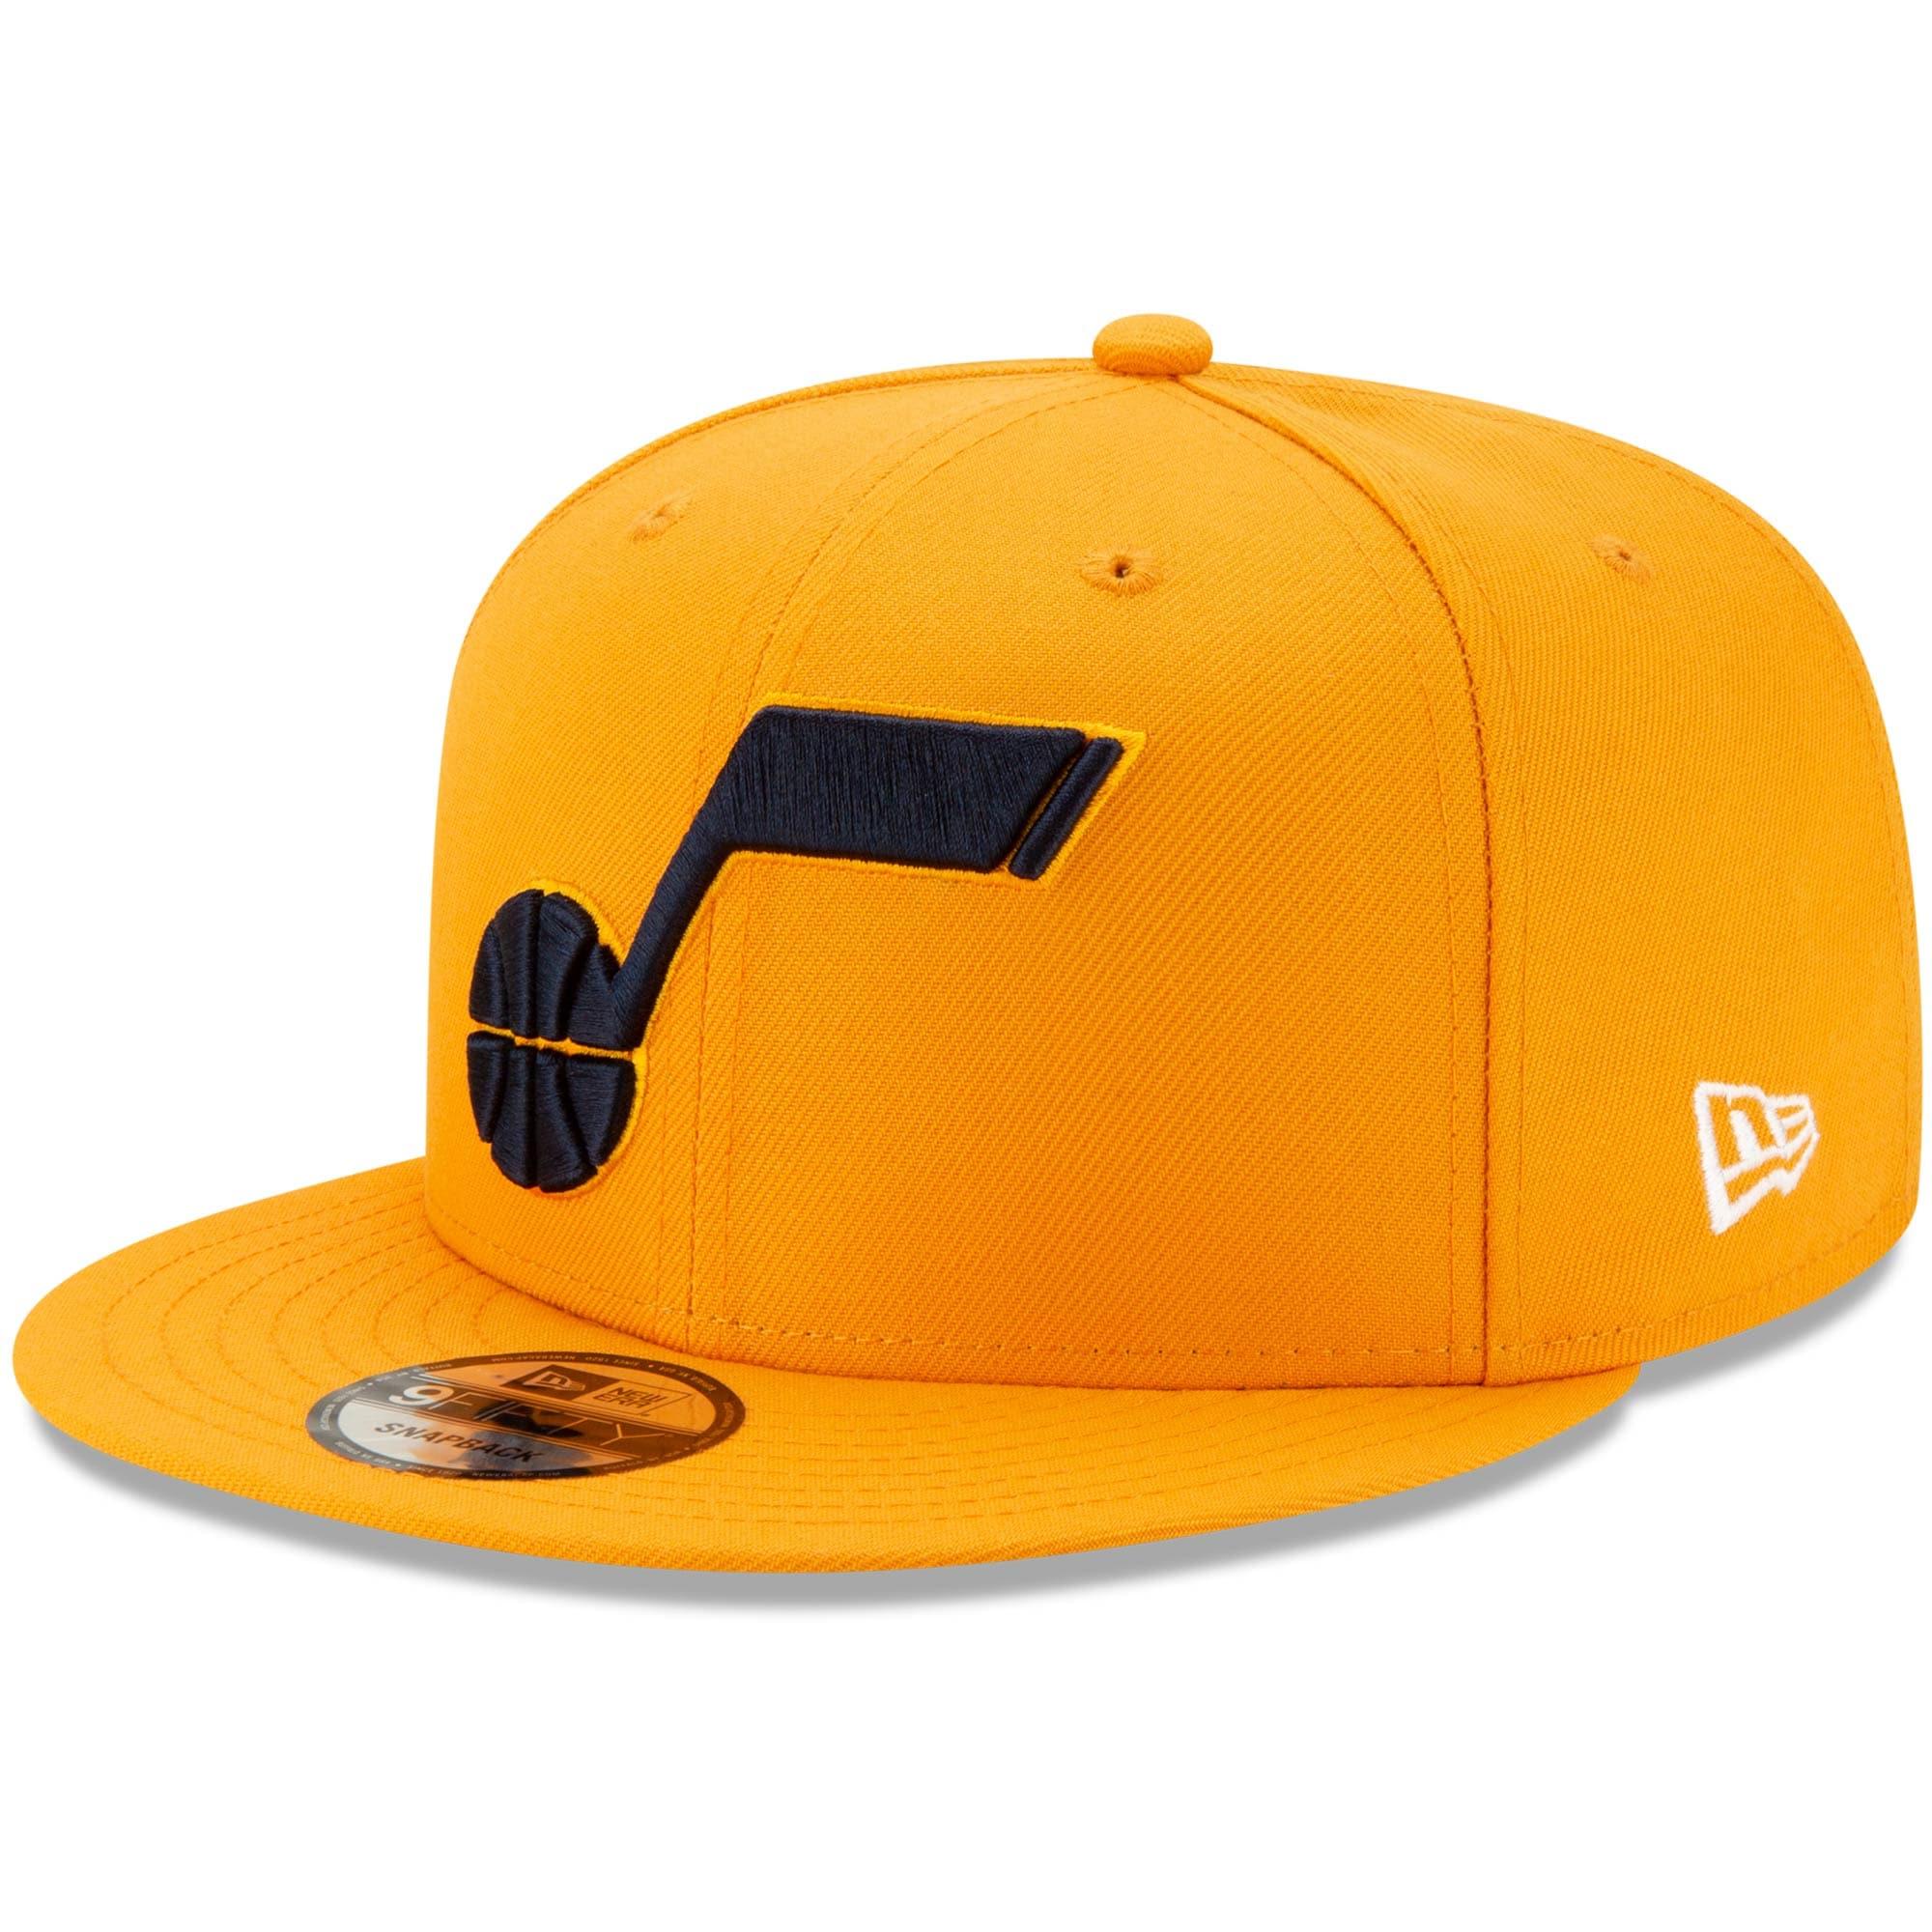 Utah Jazz New Era Statement Edition 9FIFTY Adjustable Hat - Gold